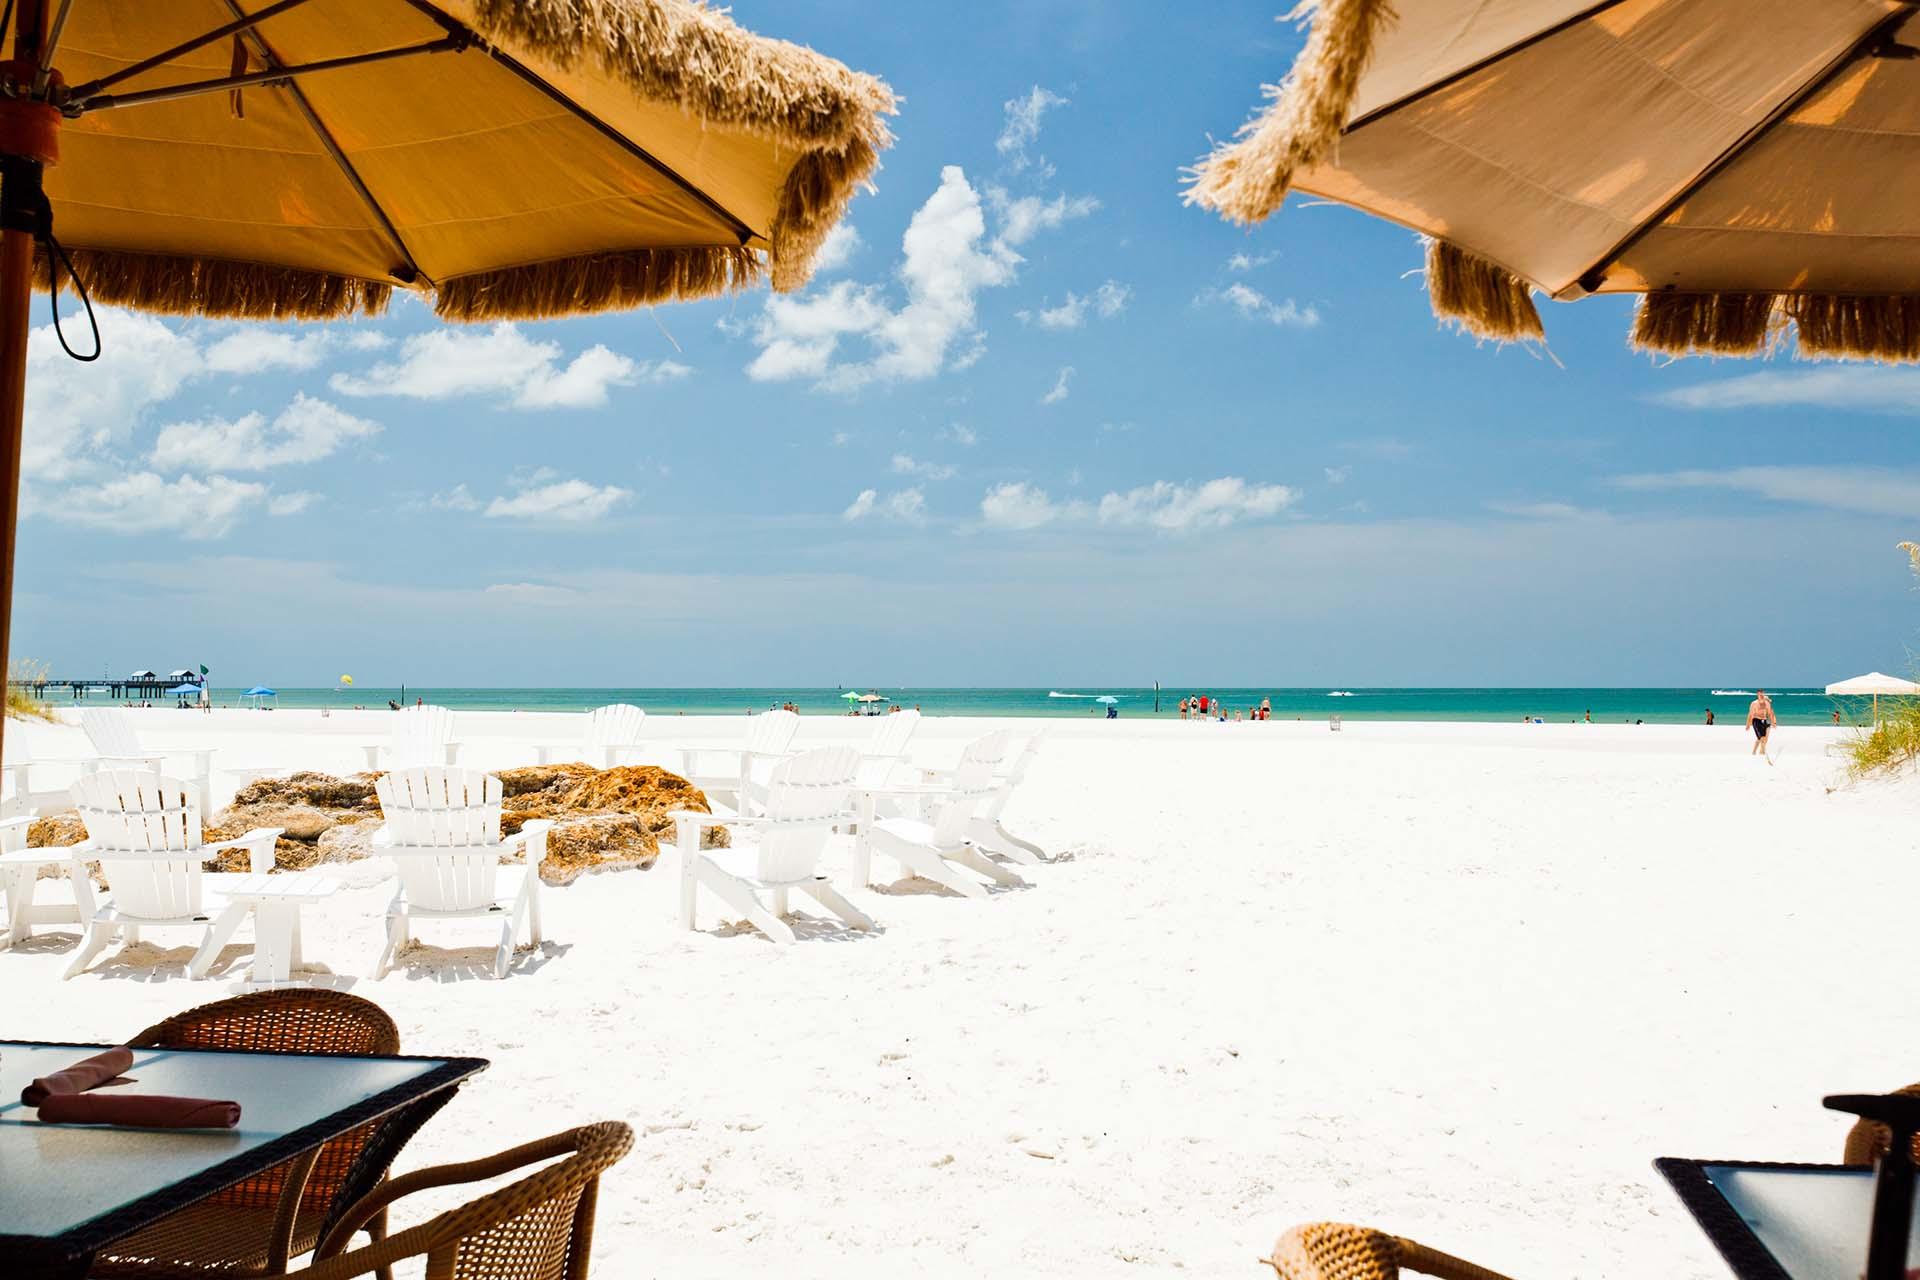 Clearwater Beach (Foto: Visit Florida/Divulgação)